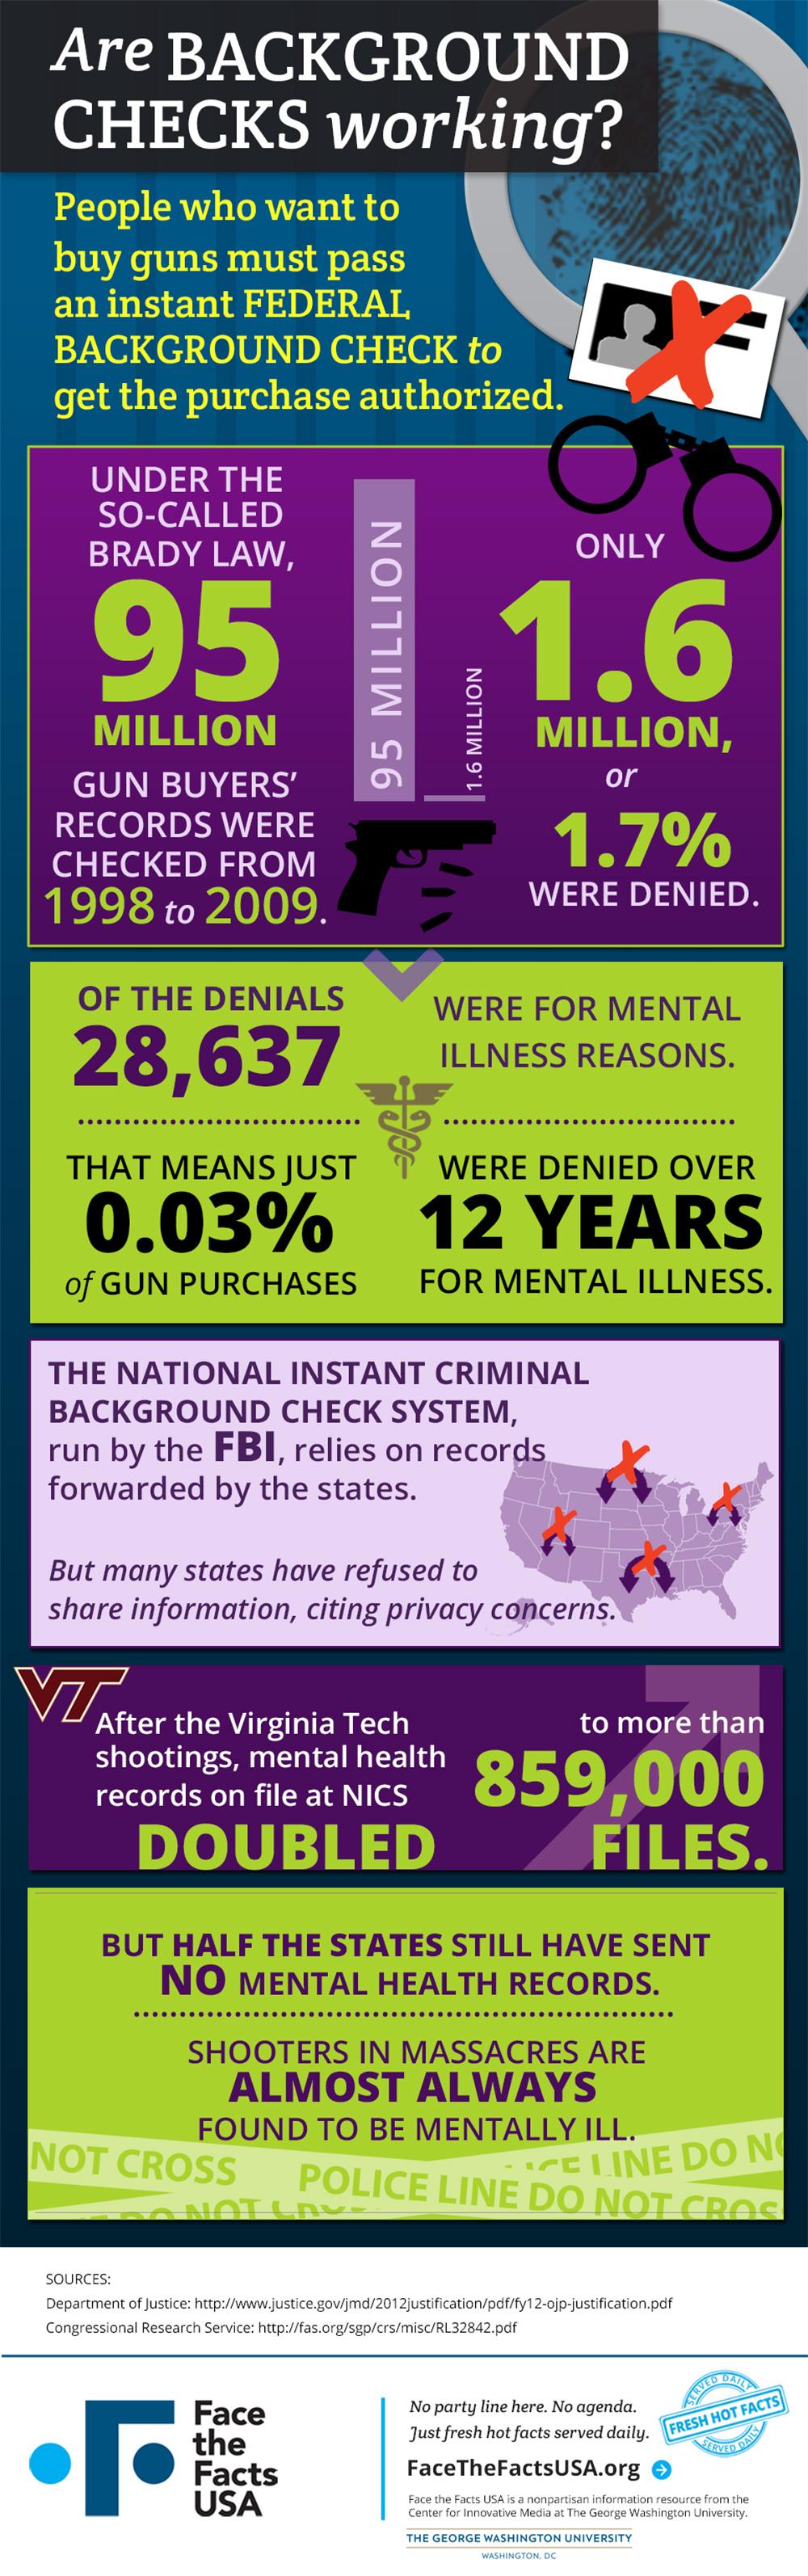 Gun Sale Background Checks Rarely Denied For Mental Illness